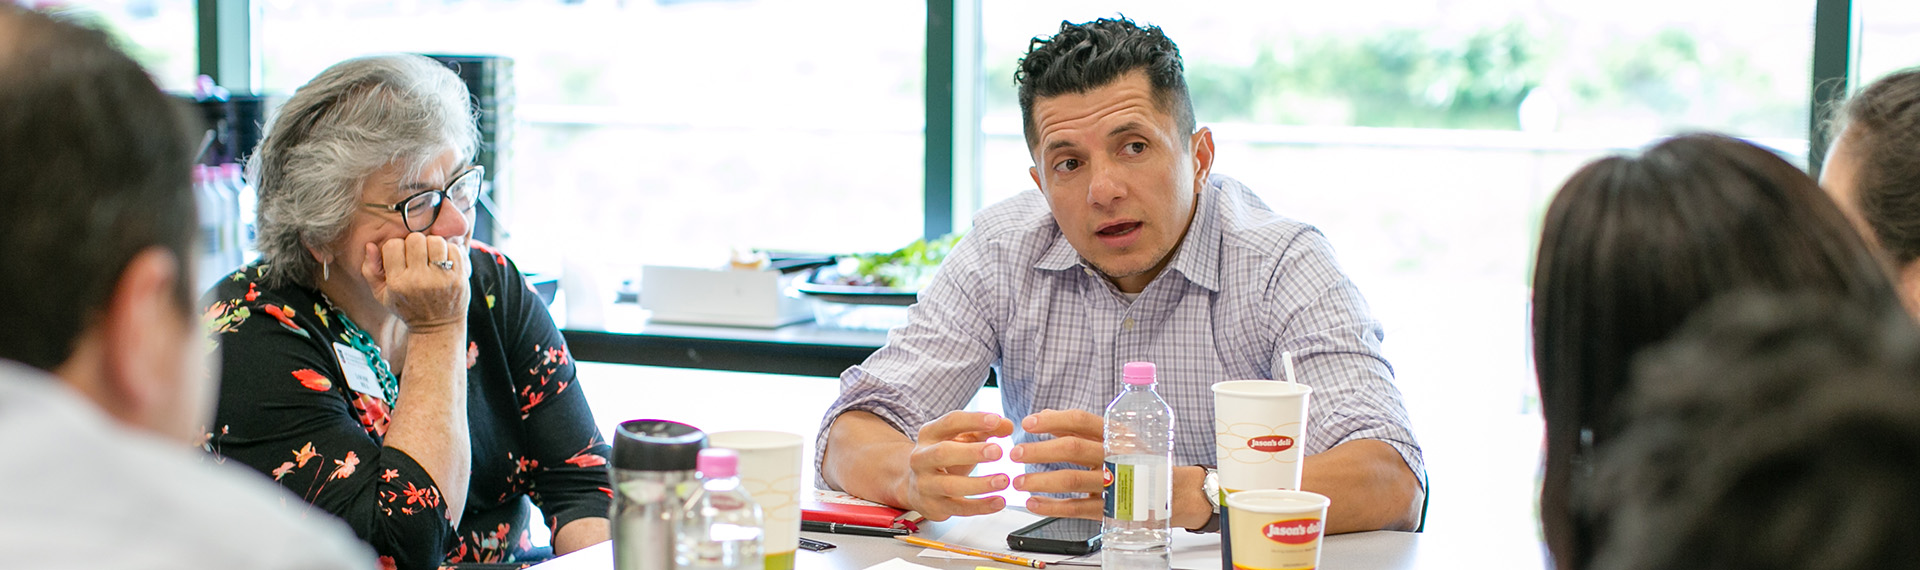 Cultivating Hispanic Leadership Institute (CHLI)